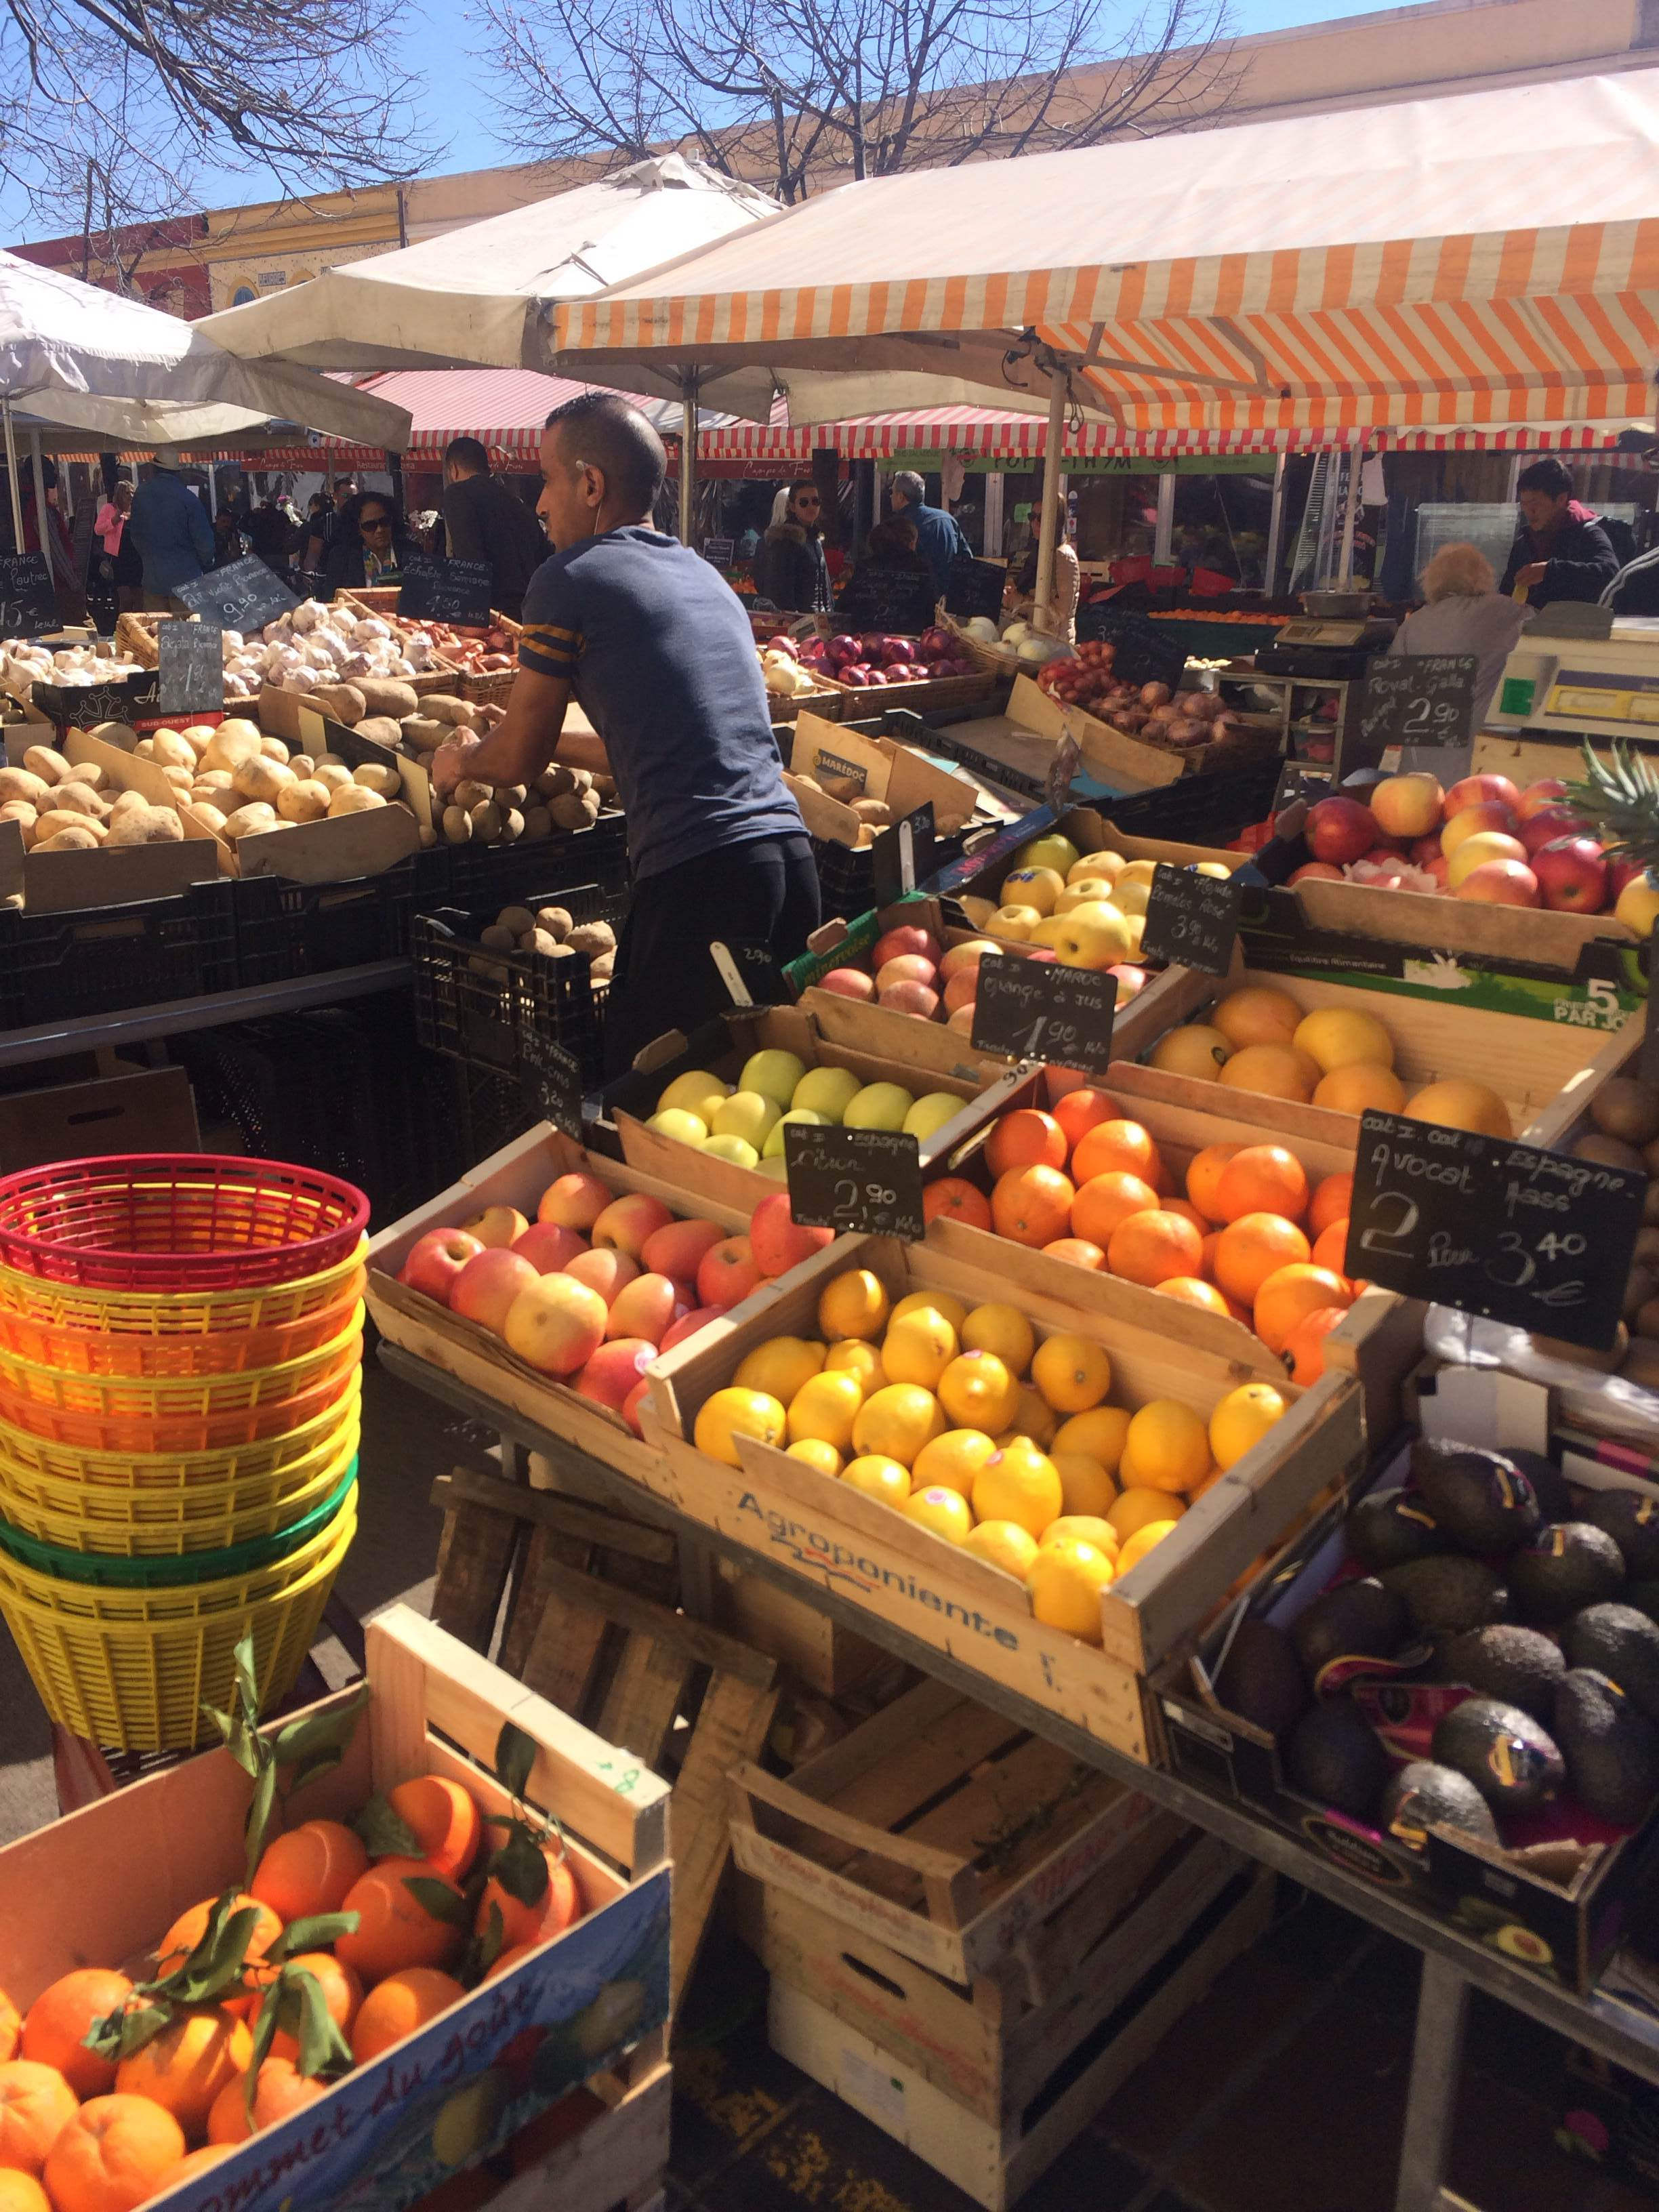 The Nice Flower Markets on Sundays